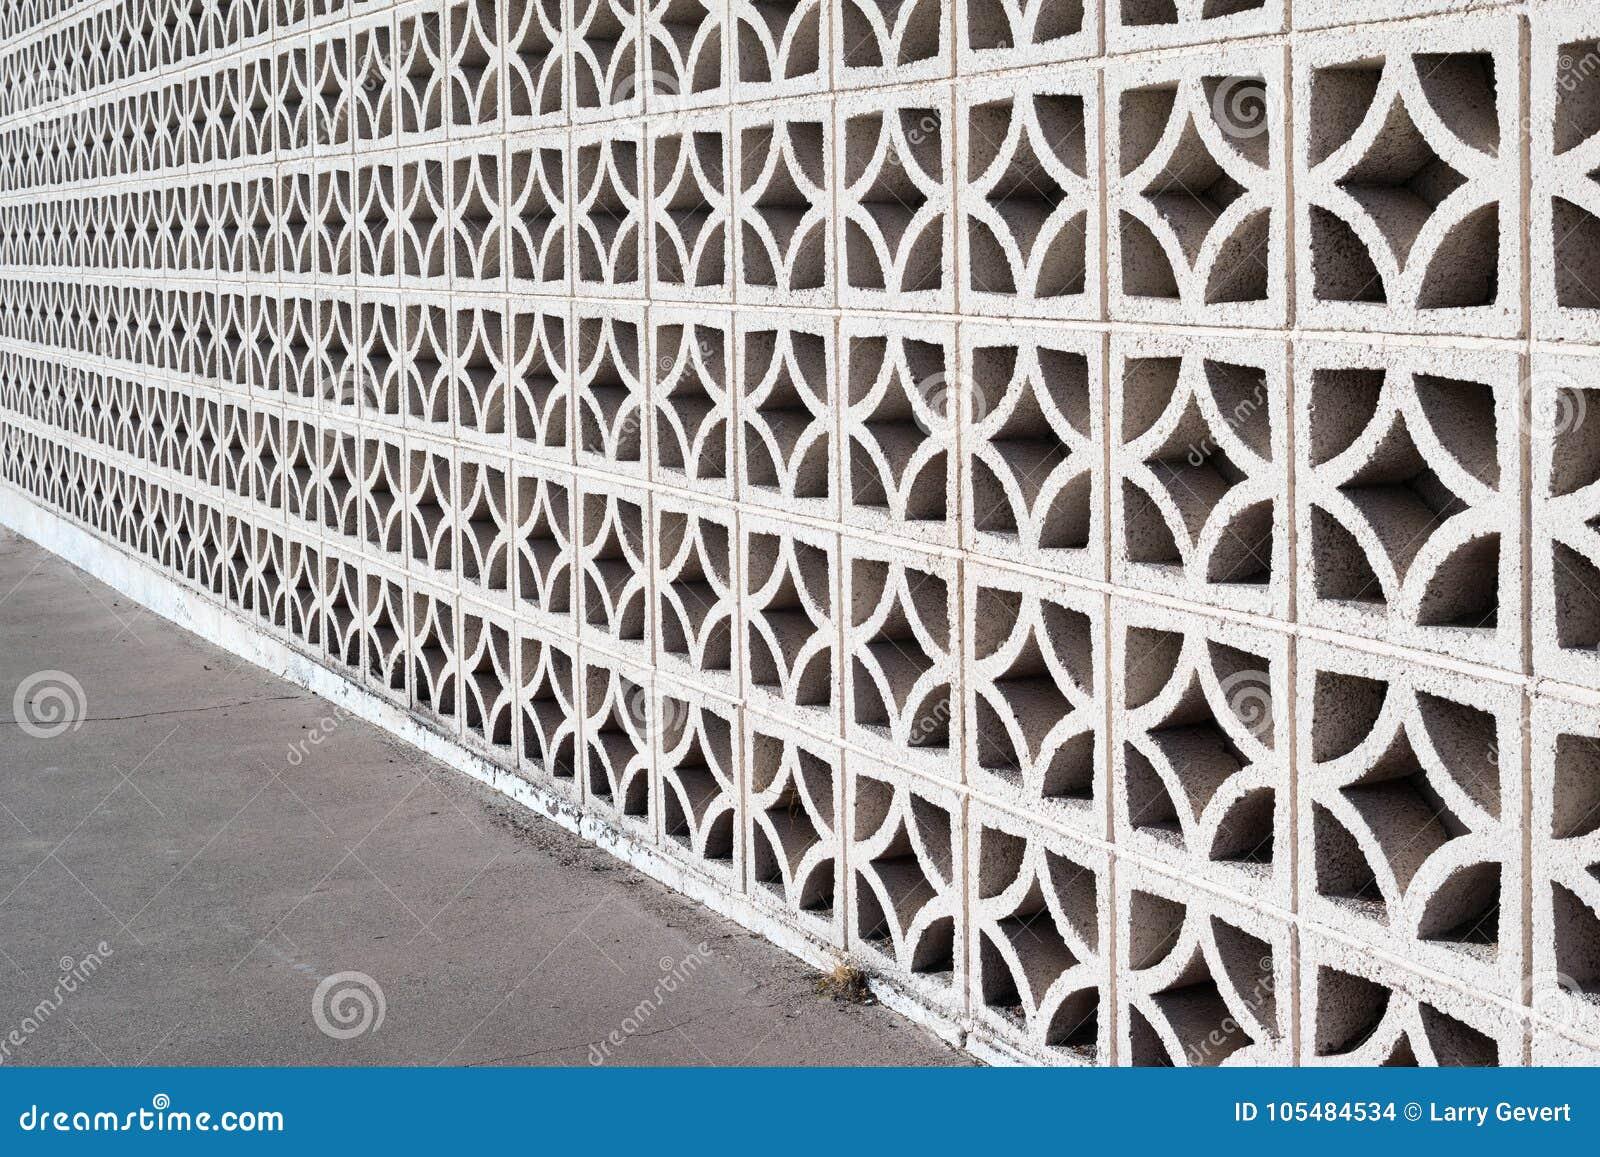 Decorative Masonry Screen Wall Stock Photo Image Of Concrete Line